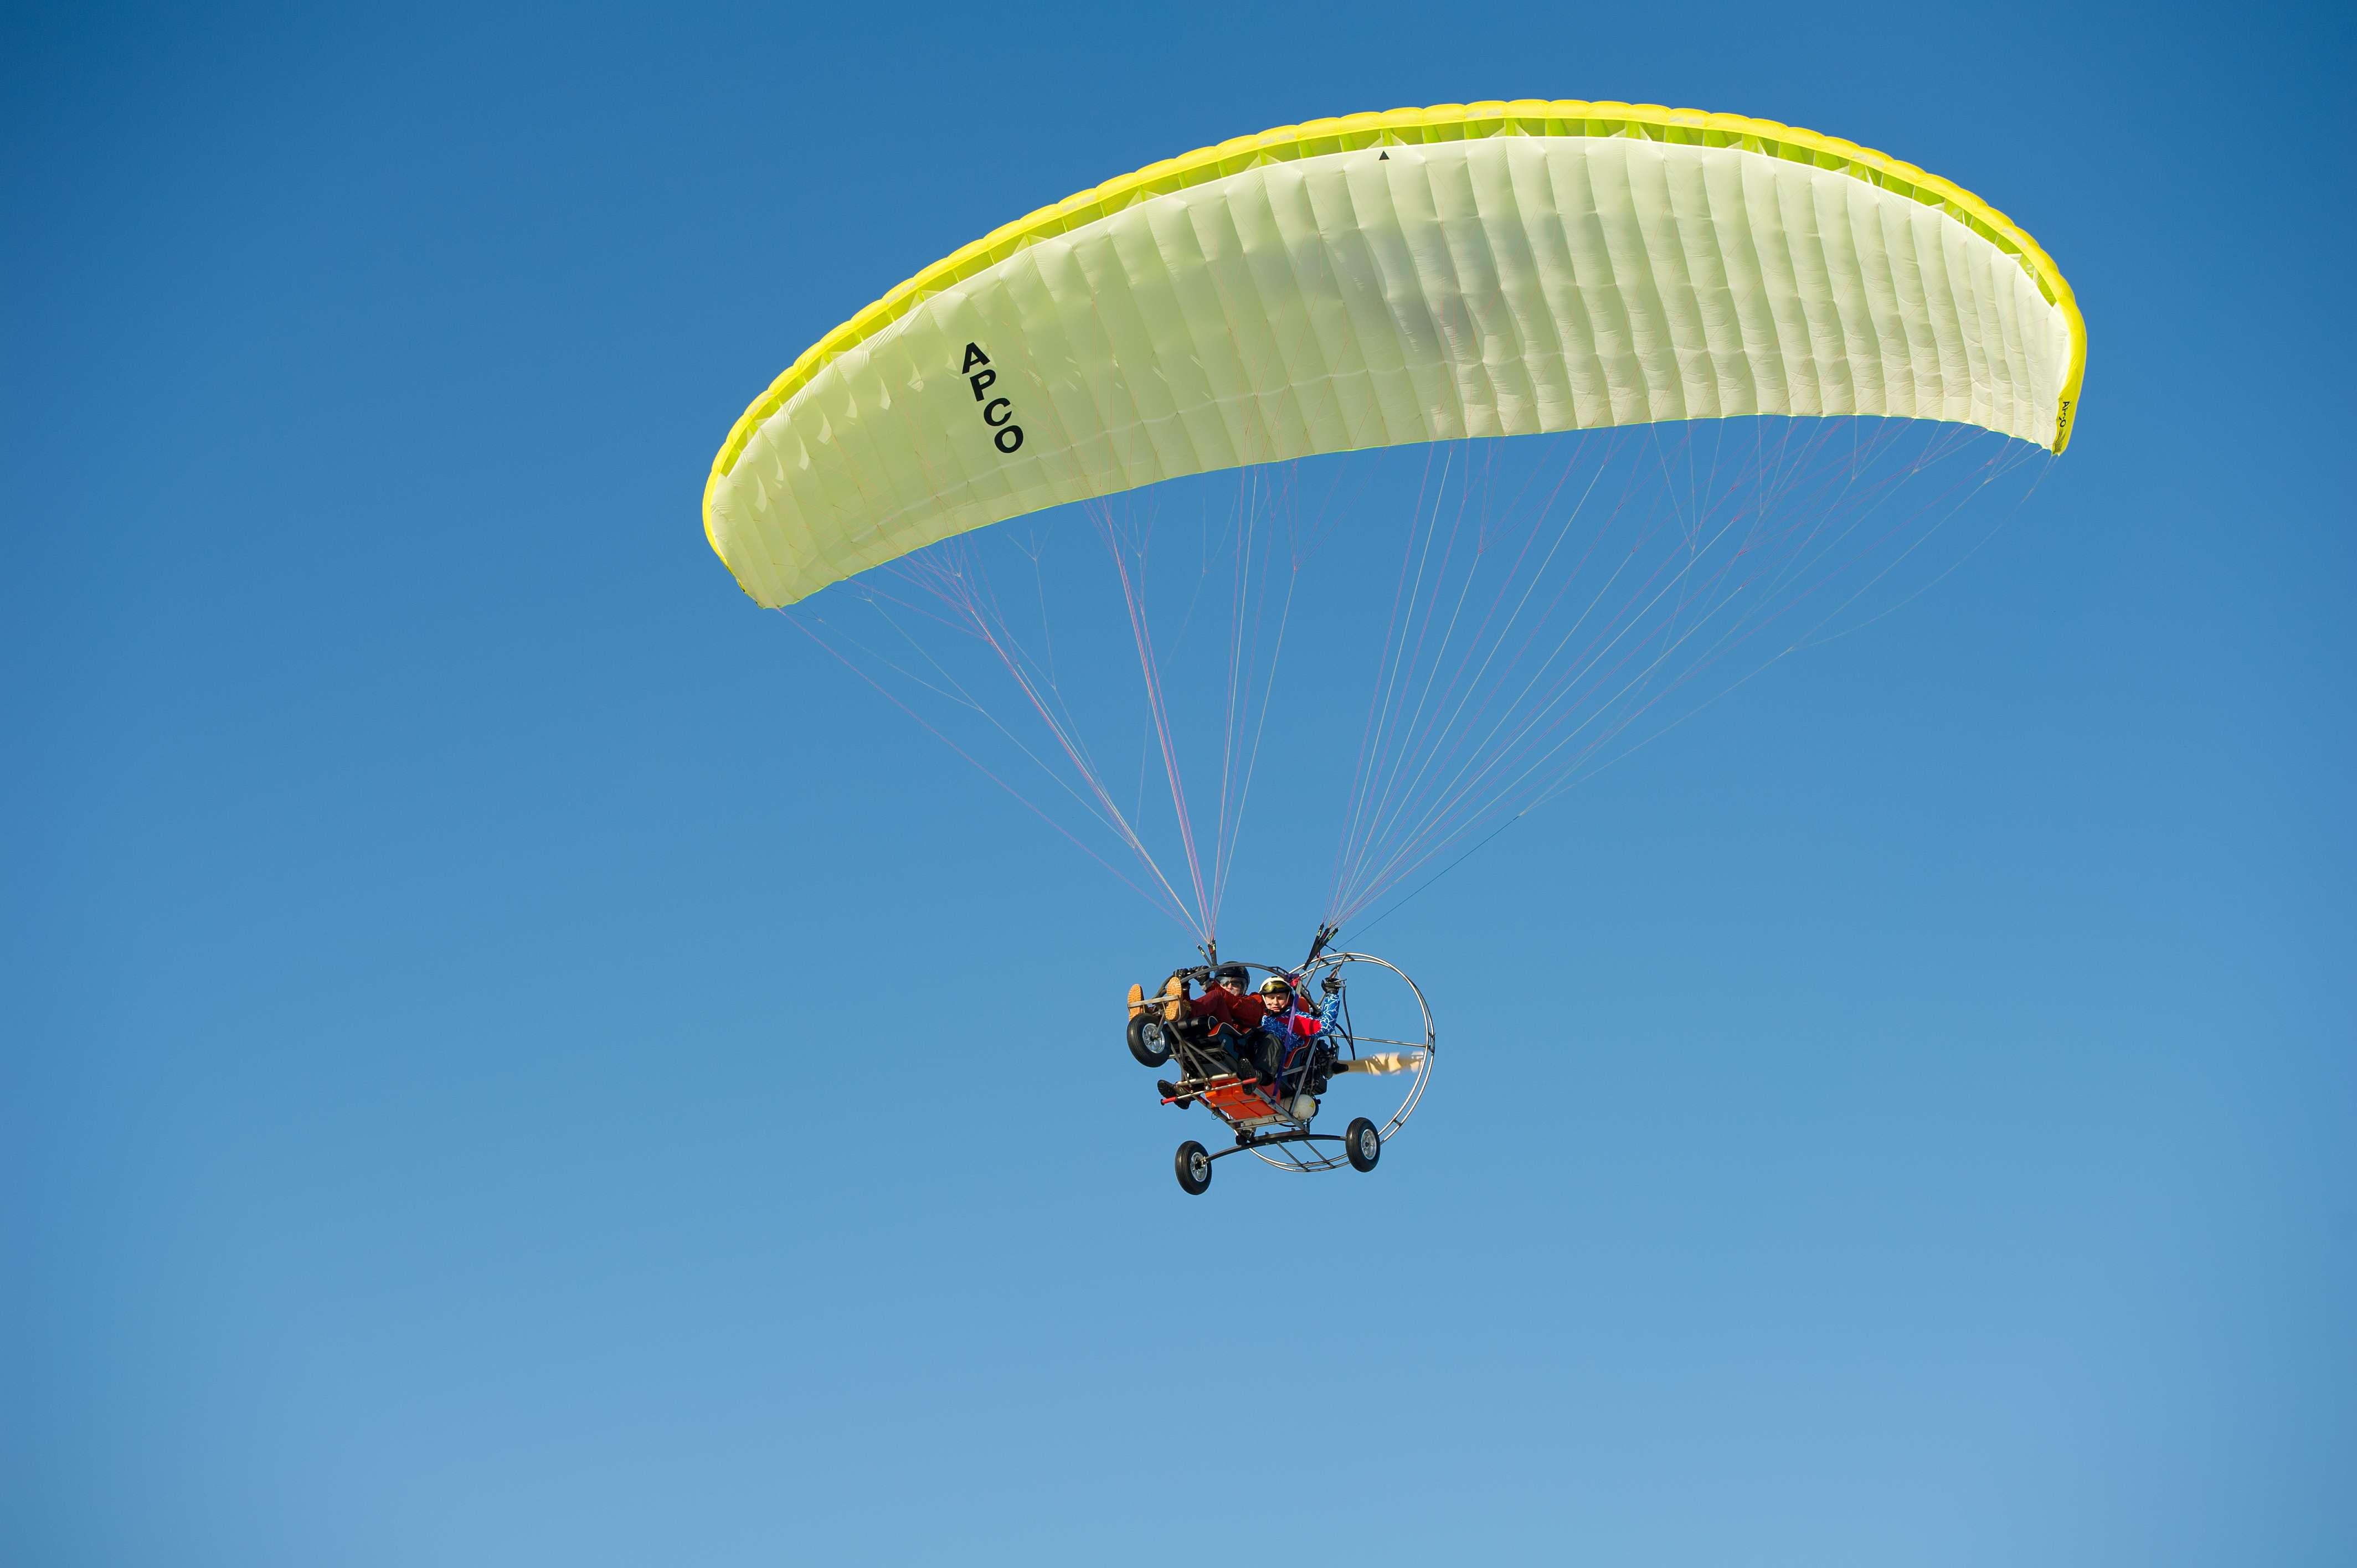 Para-Motoring in Gurgaon - Paragliding Delhi NCR | Adventure